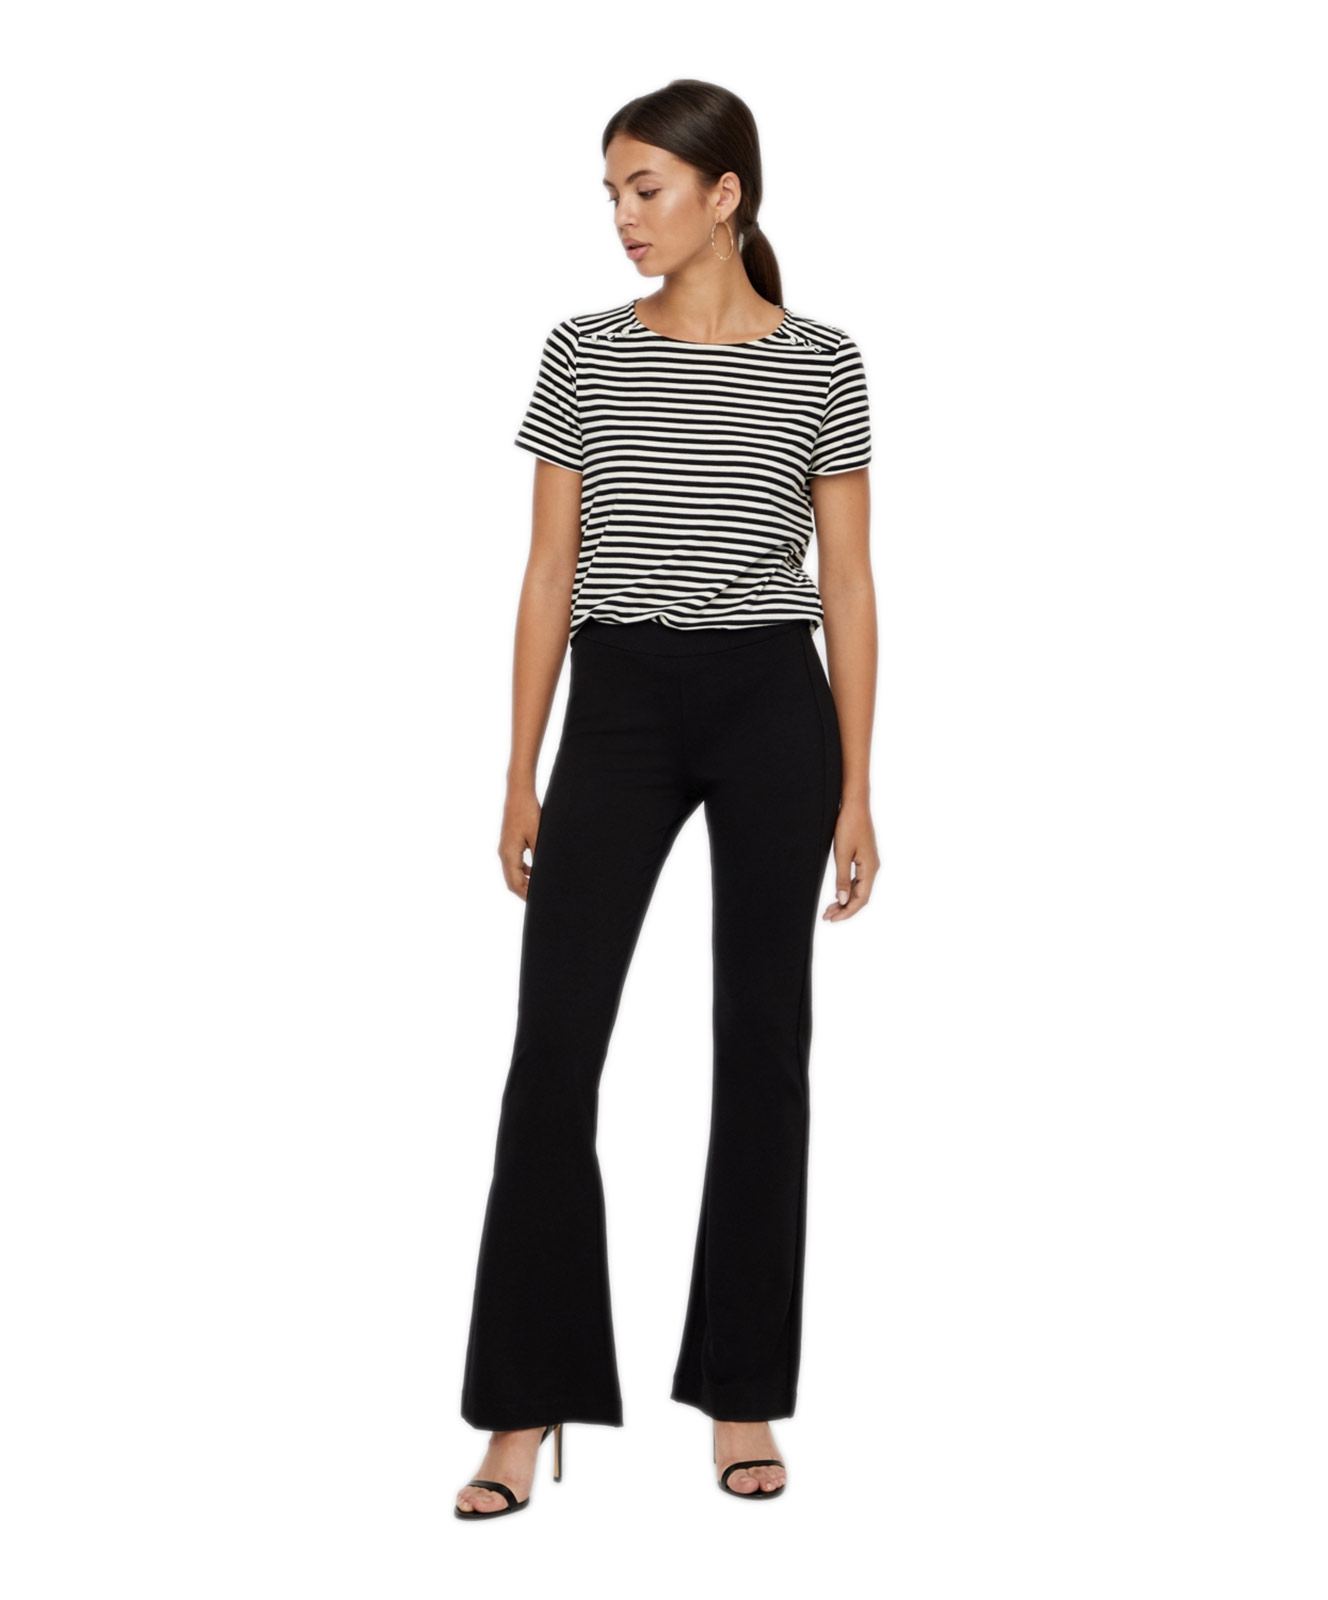 Hosen - Vero Moda Stoffhose Kamma in Black  - Onlineshop Jeans Meile